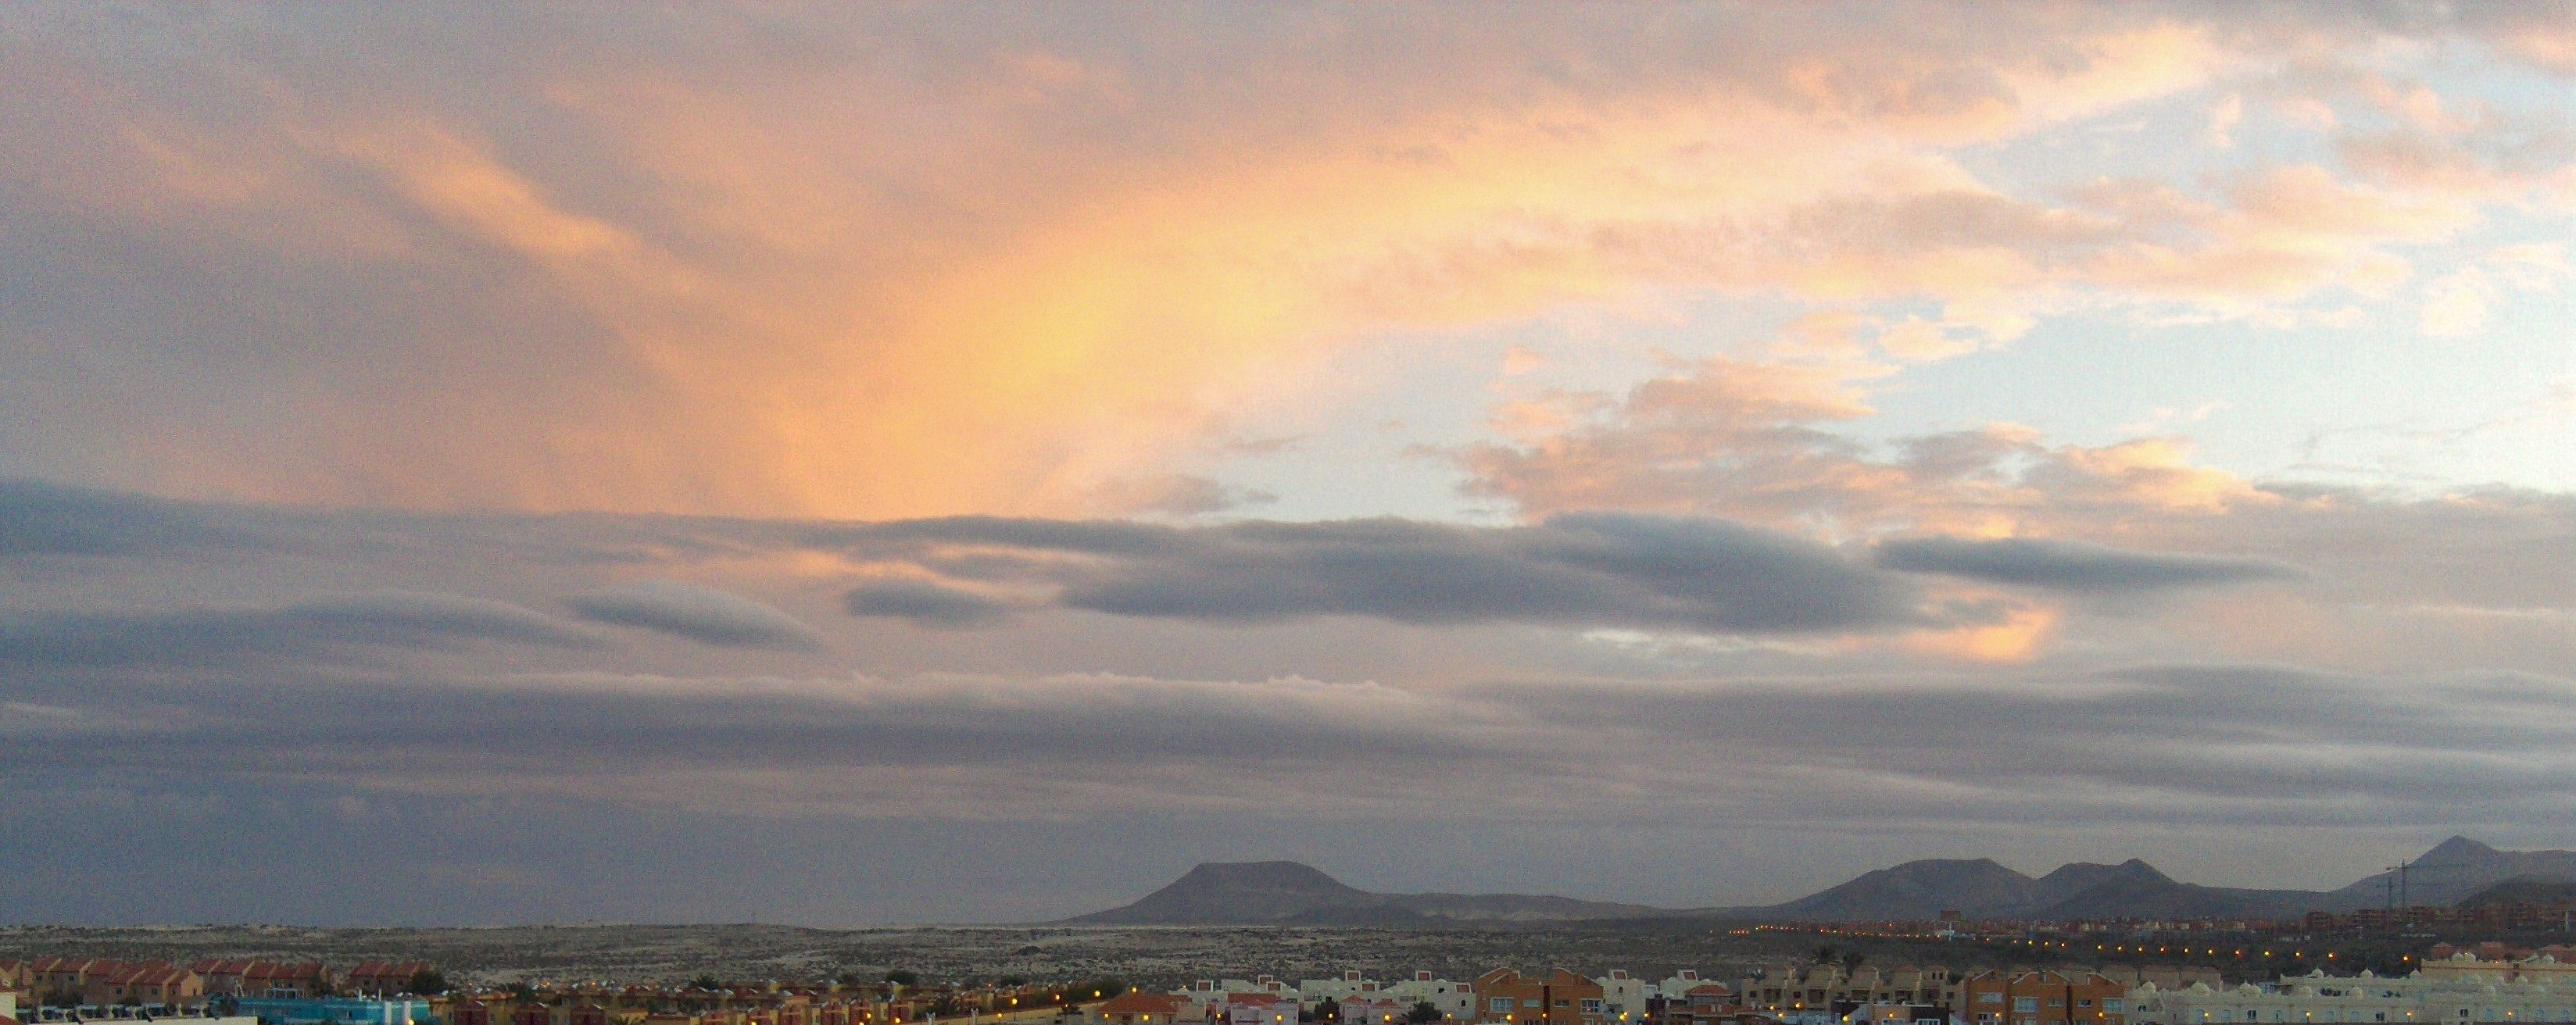 Fuerteventura..Canary Islands